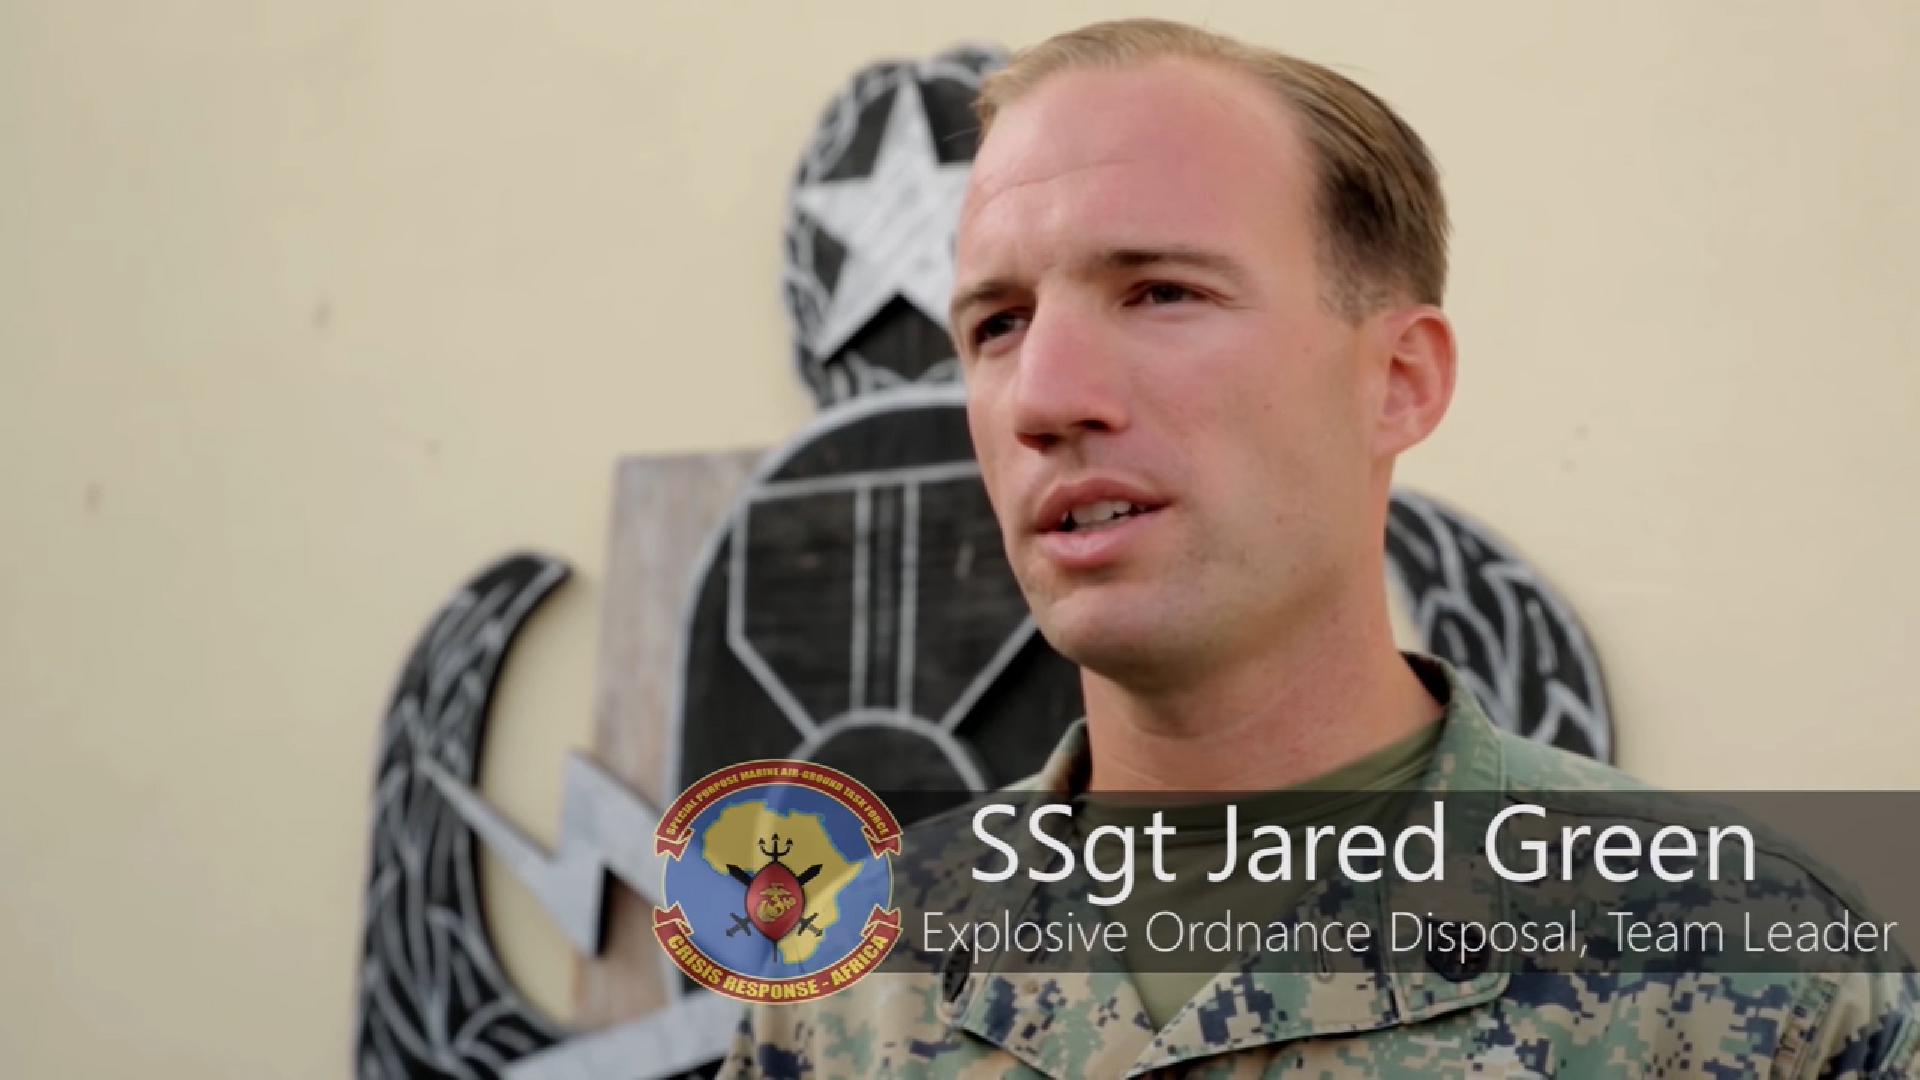 3d gedruckter sprengstoff us marines3 - Neue US-Marines Initiative testet 3D-gedruckten Sprengstoff